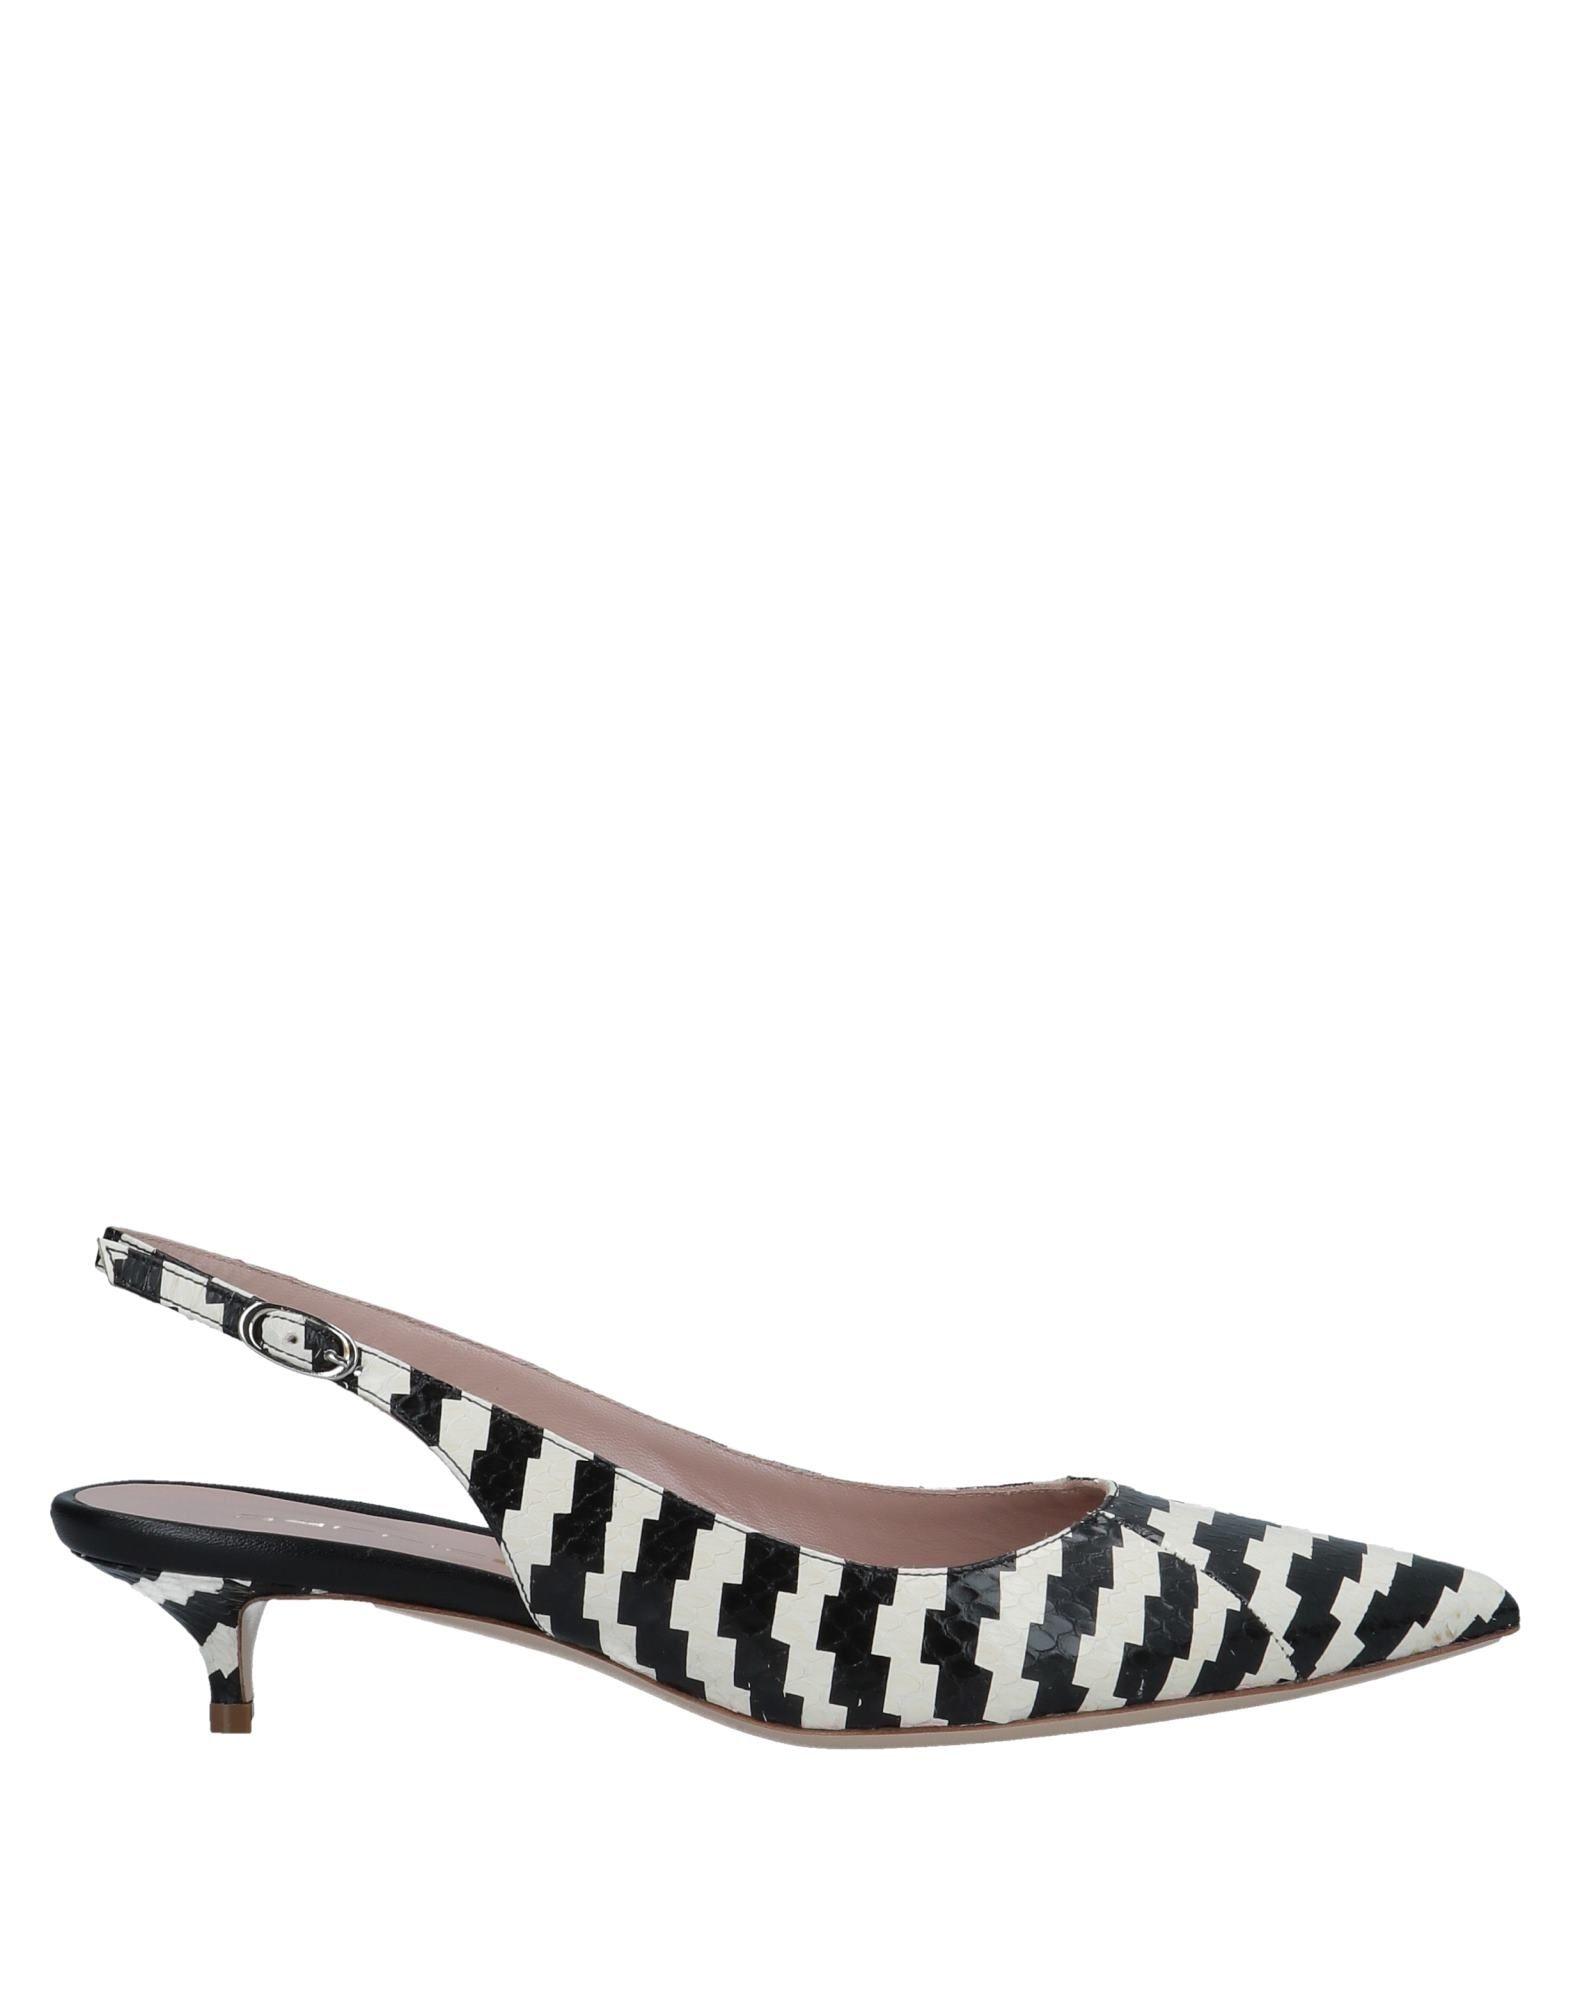 Mocassino Mot-Clè offerte Donna - 11487272KP Nuove offerte Mot-Clè e scarpe comode 81dd51